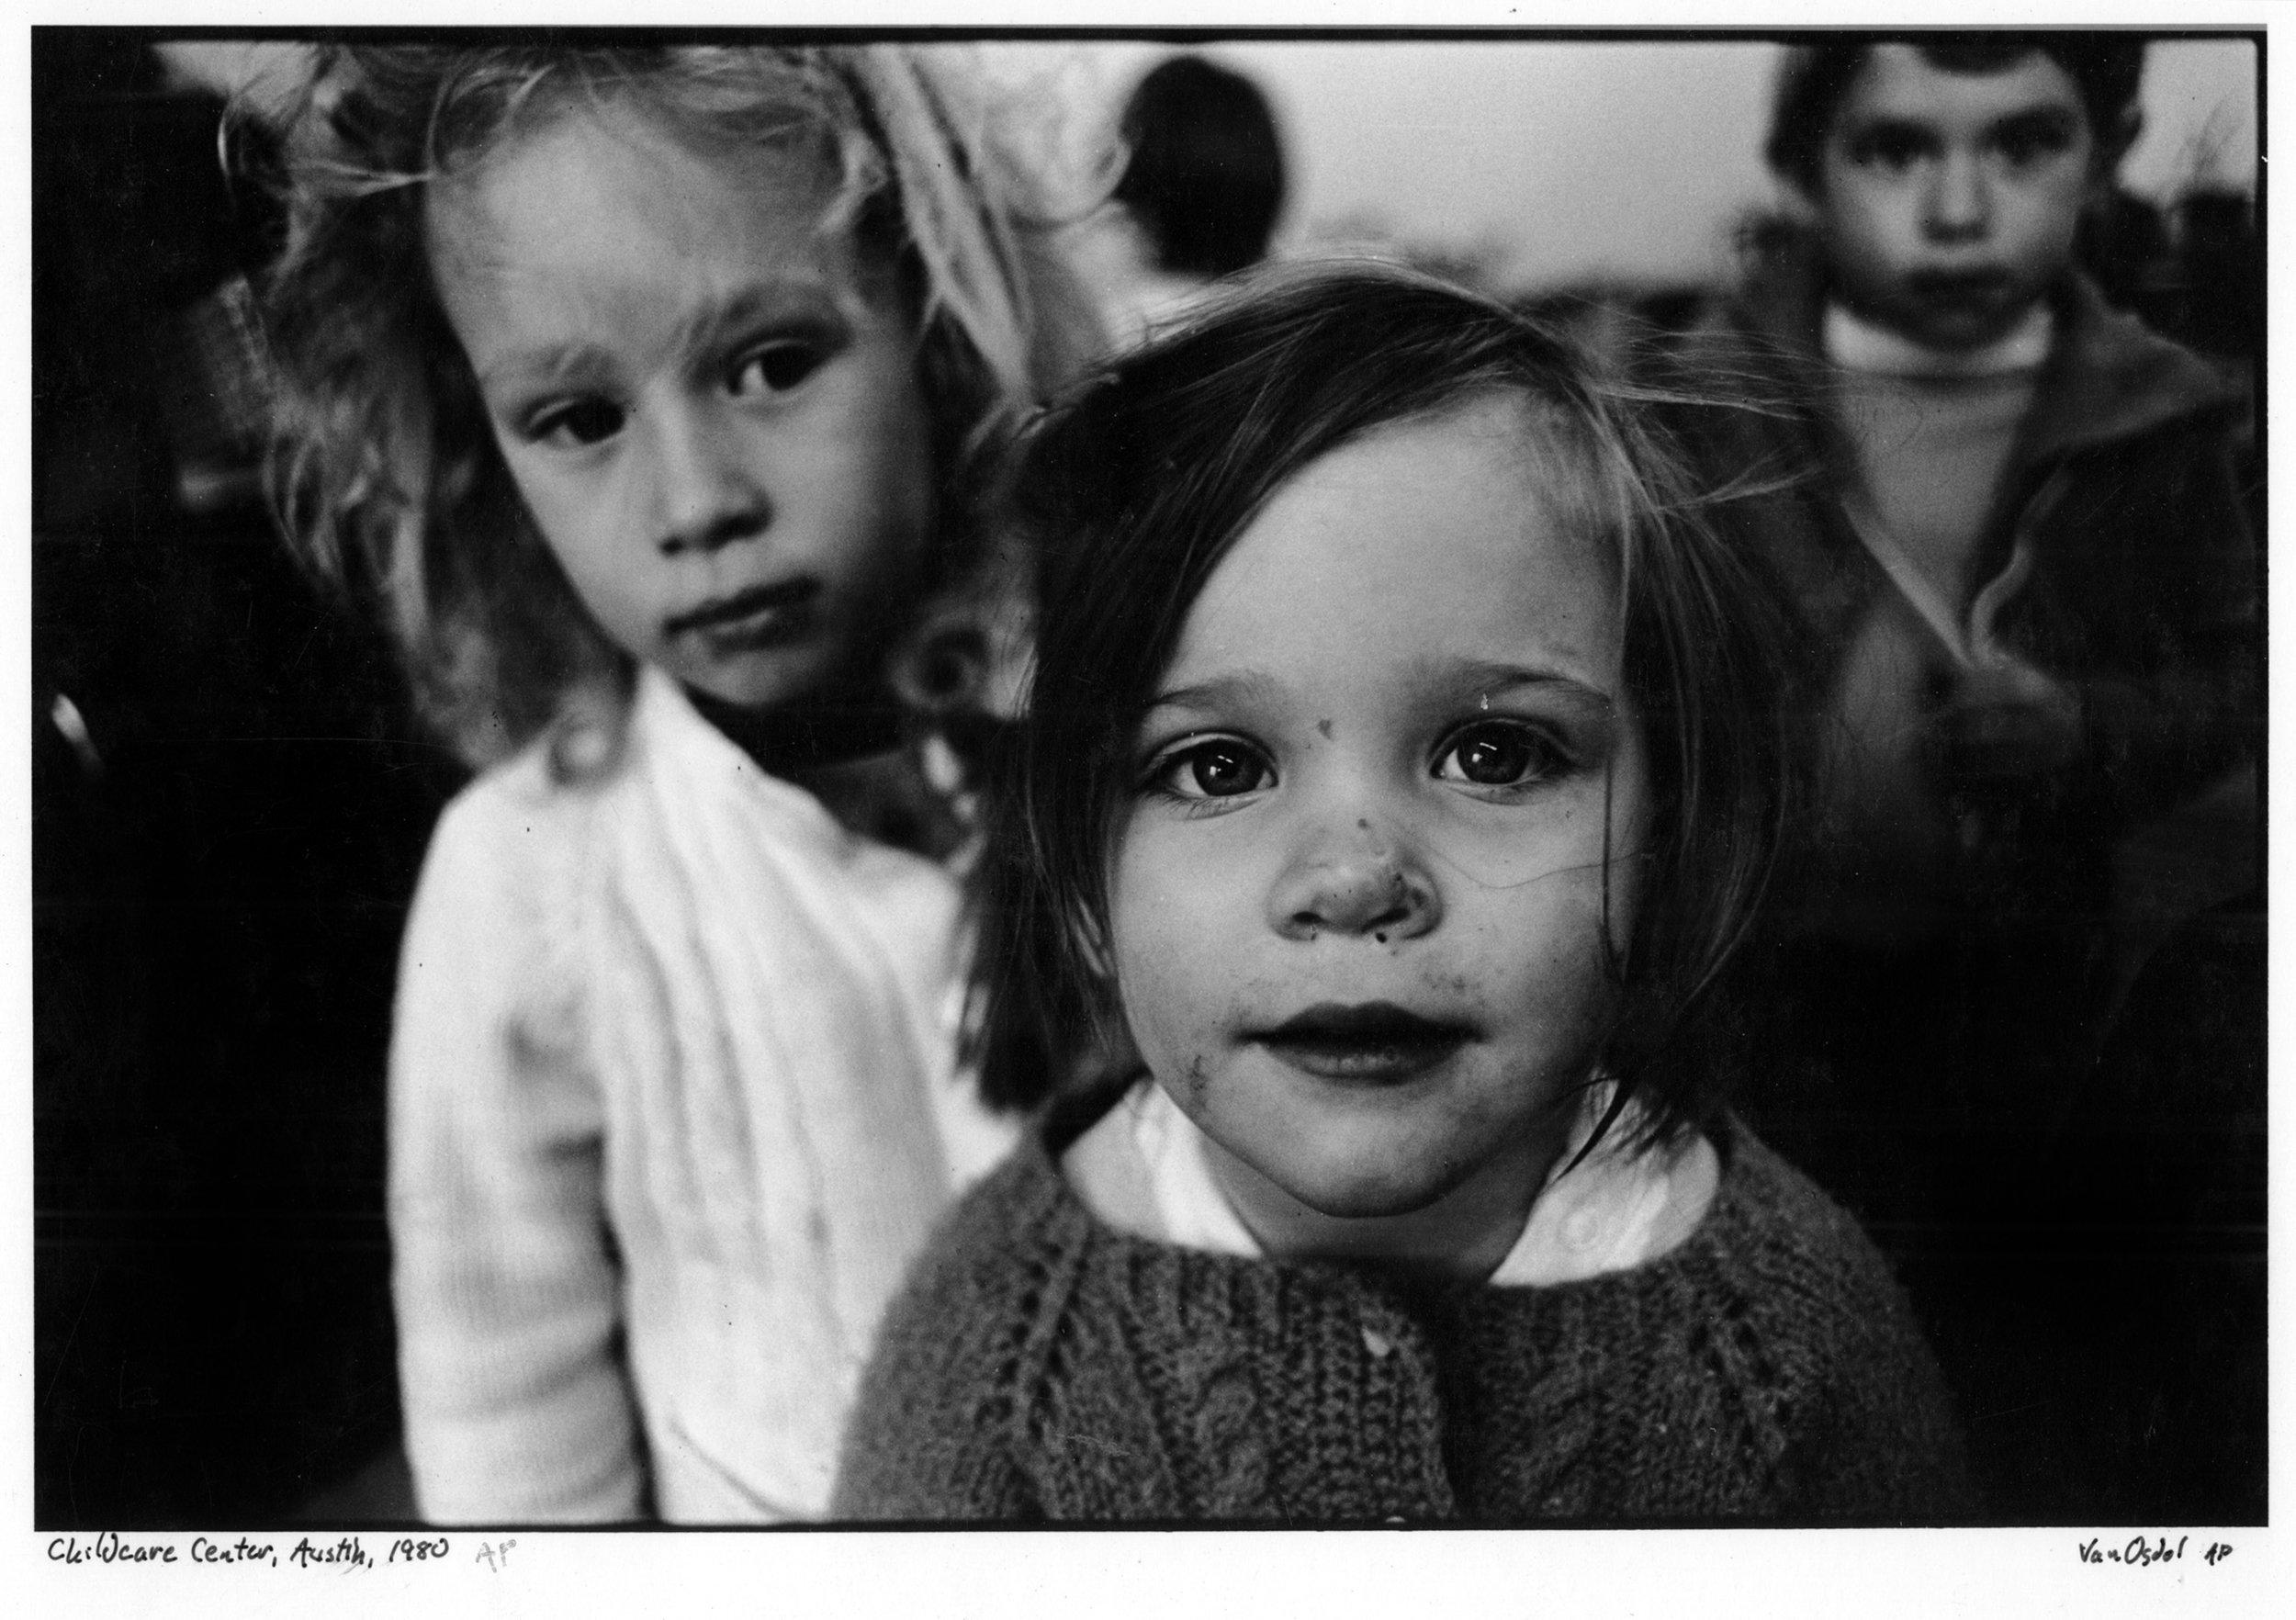 Child Care Center, Austin, 1980